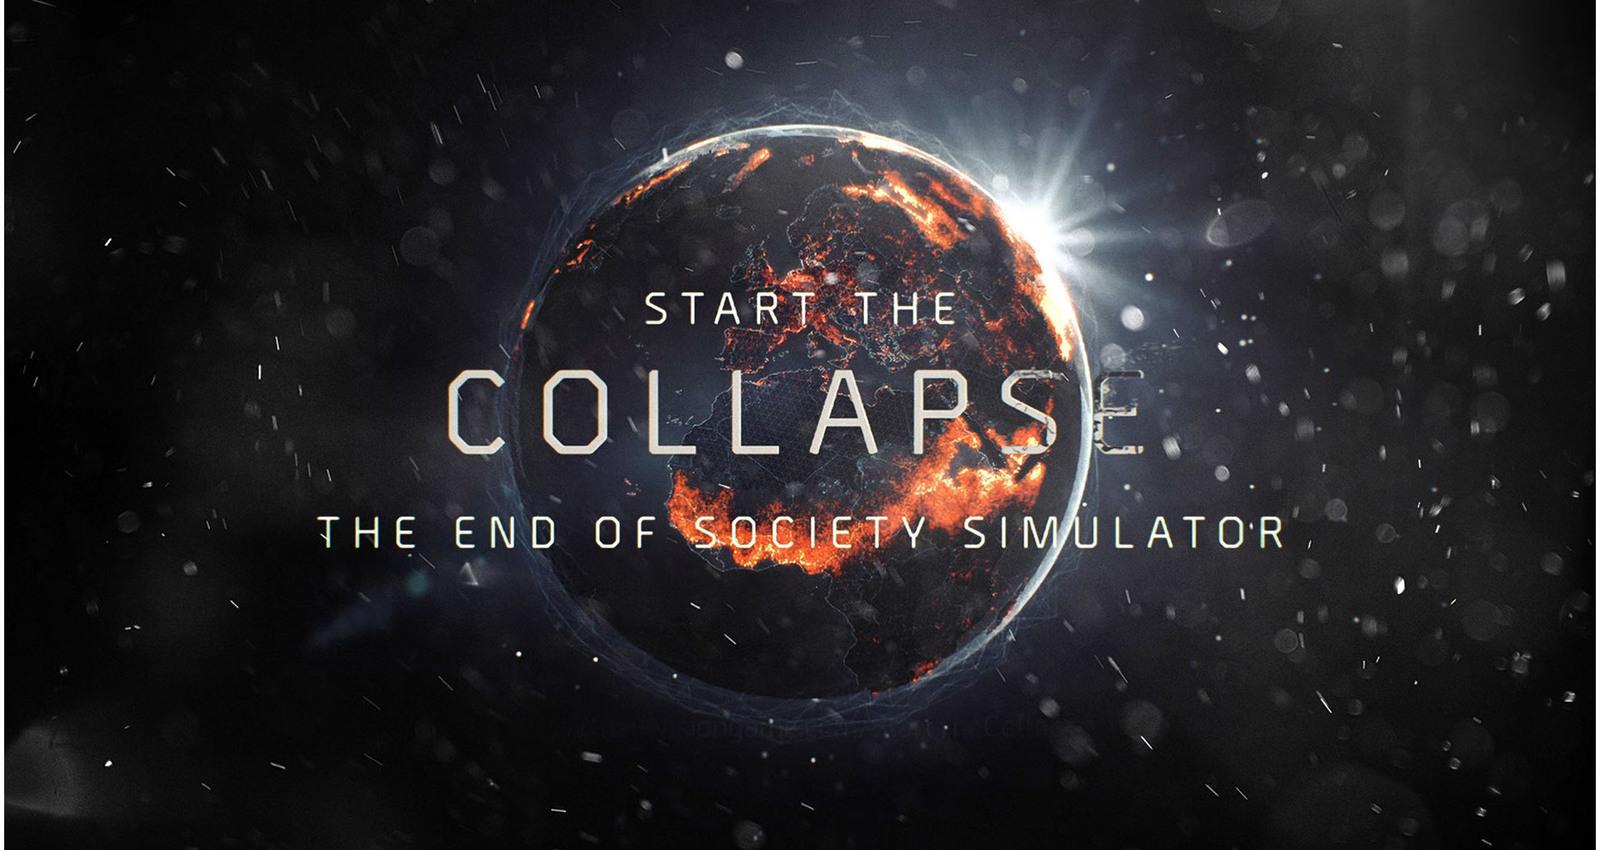 End of society simulator